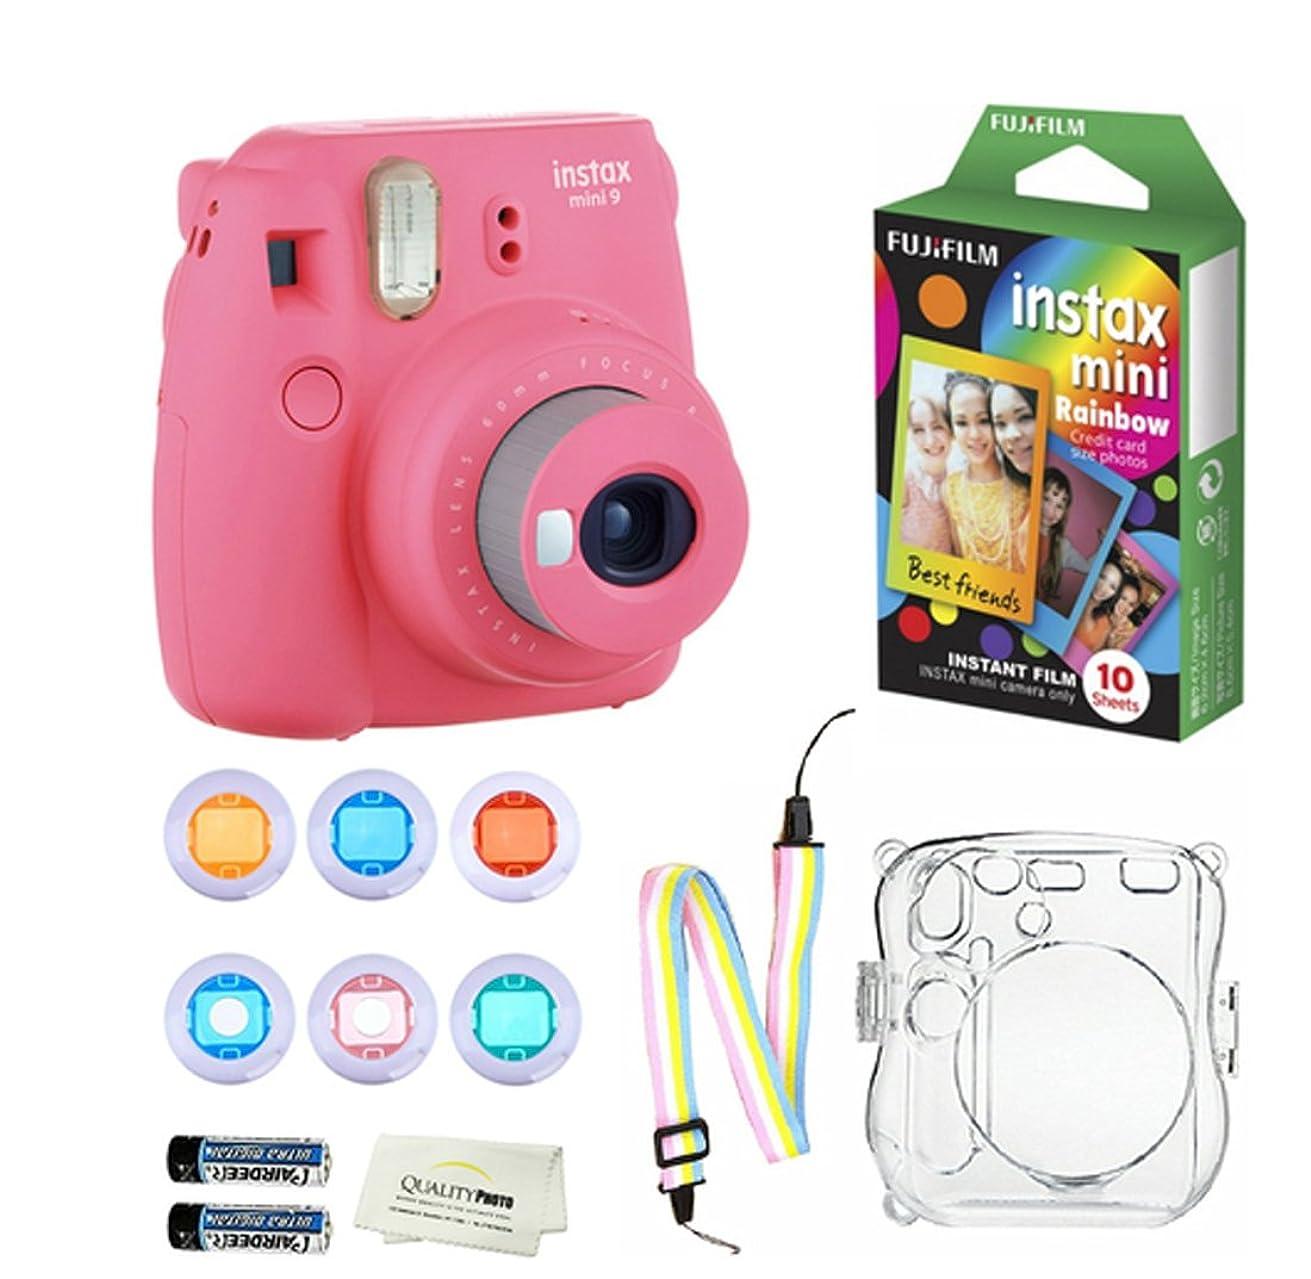 Fujifilm Instax Mini 9 Instant Camera (Flamingo Pink) + 10 Fuji Instant Rainbow Film Sheets + Convenient Instax Clear Case W/ Rainbow Strap + 6-Color Lenses & More